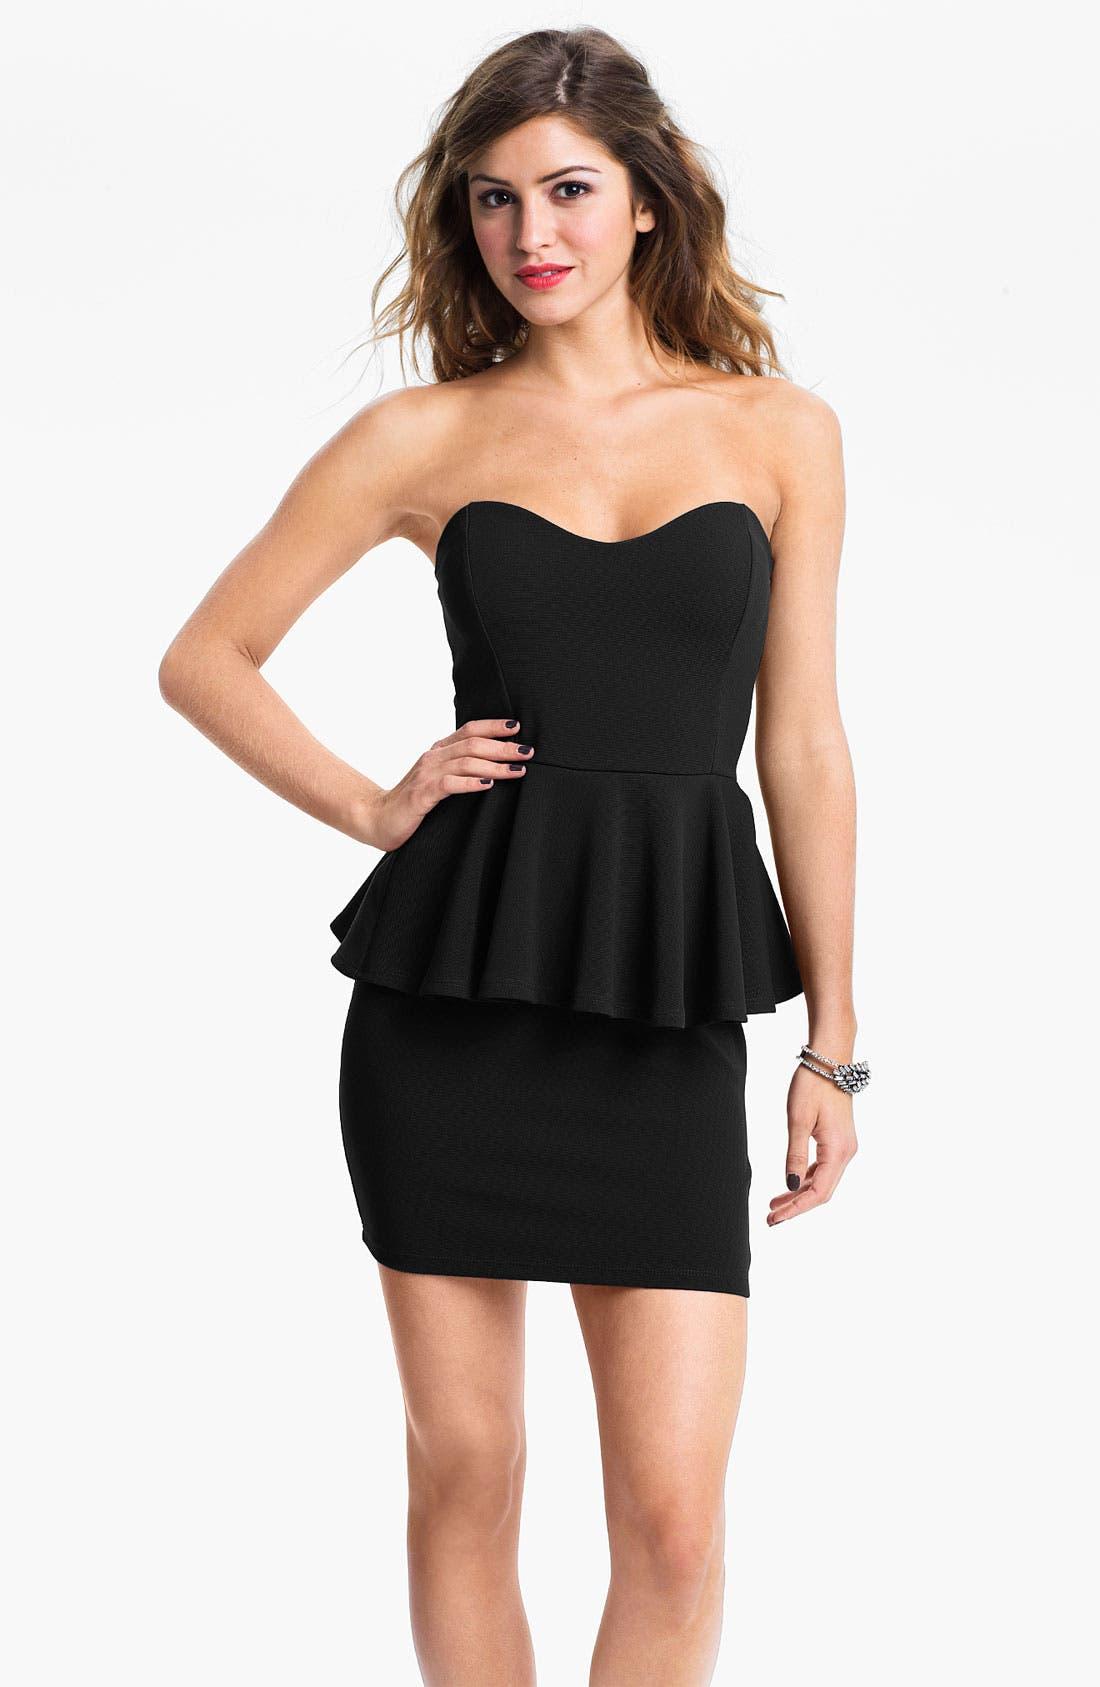 Alternate Image 1 Selected - Lush Strapless Peplum Dress (Juniors)